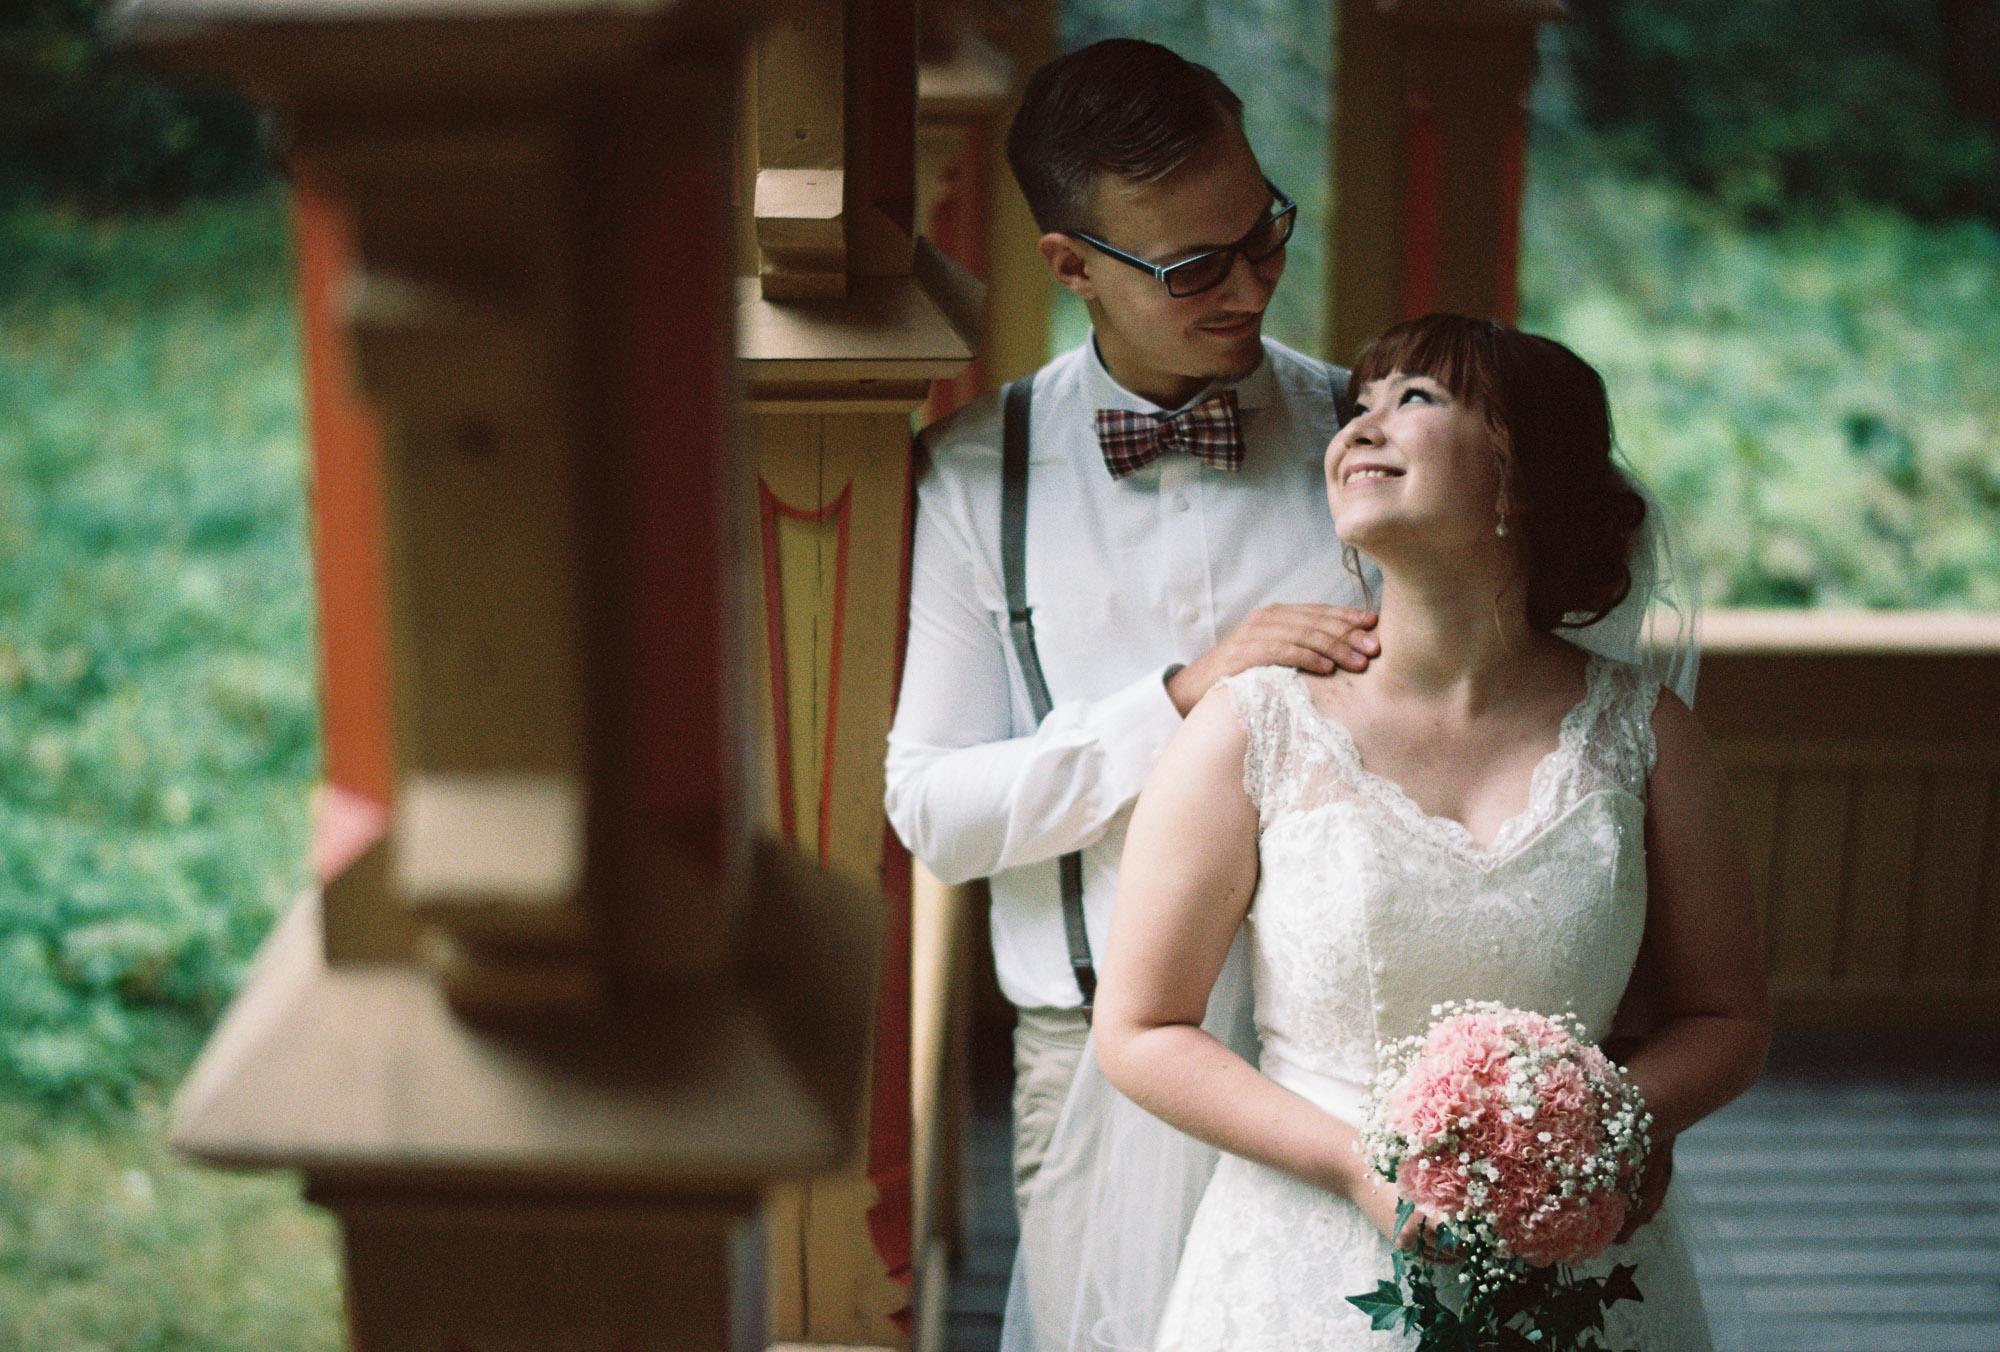 jere-satamo-analog-film-wedding-photographer-finland-115.jpg